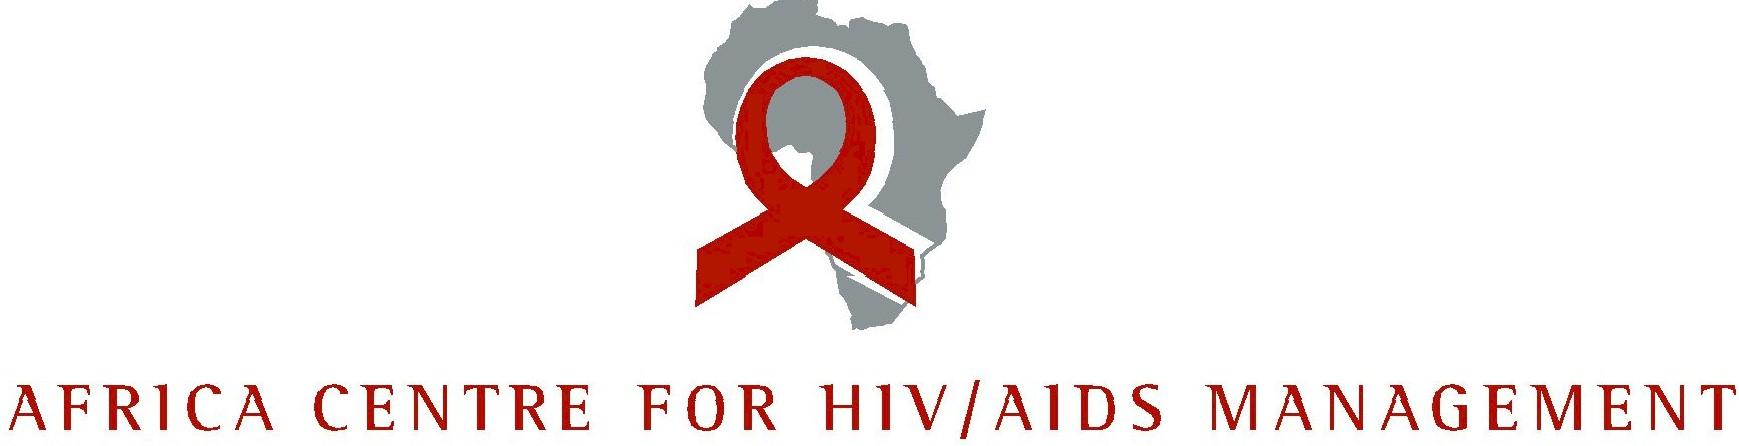 africa-centre-logo